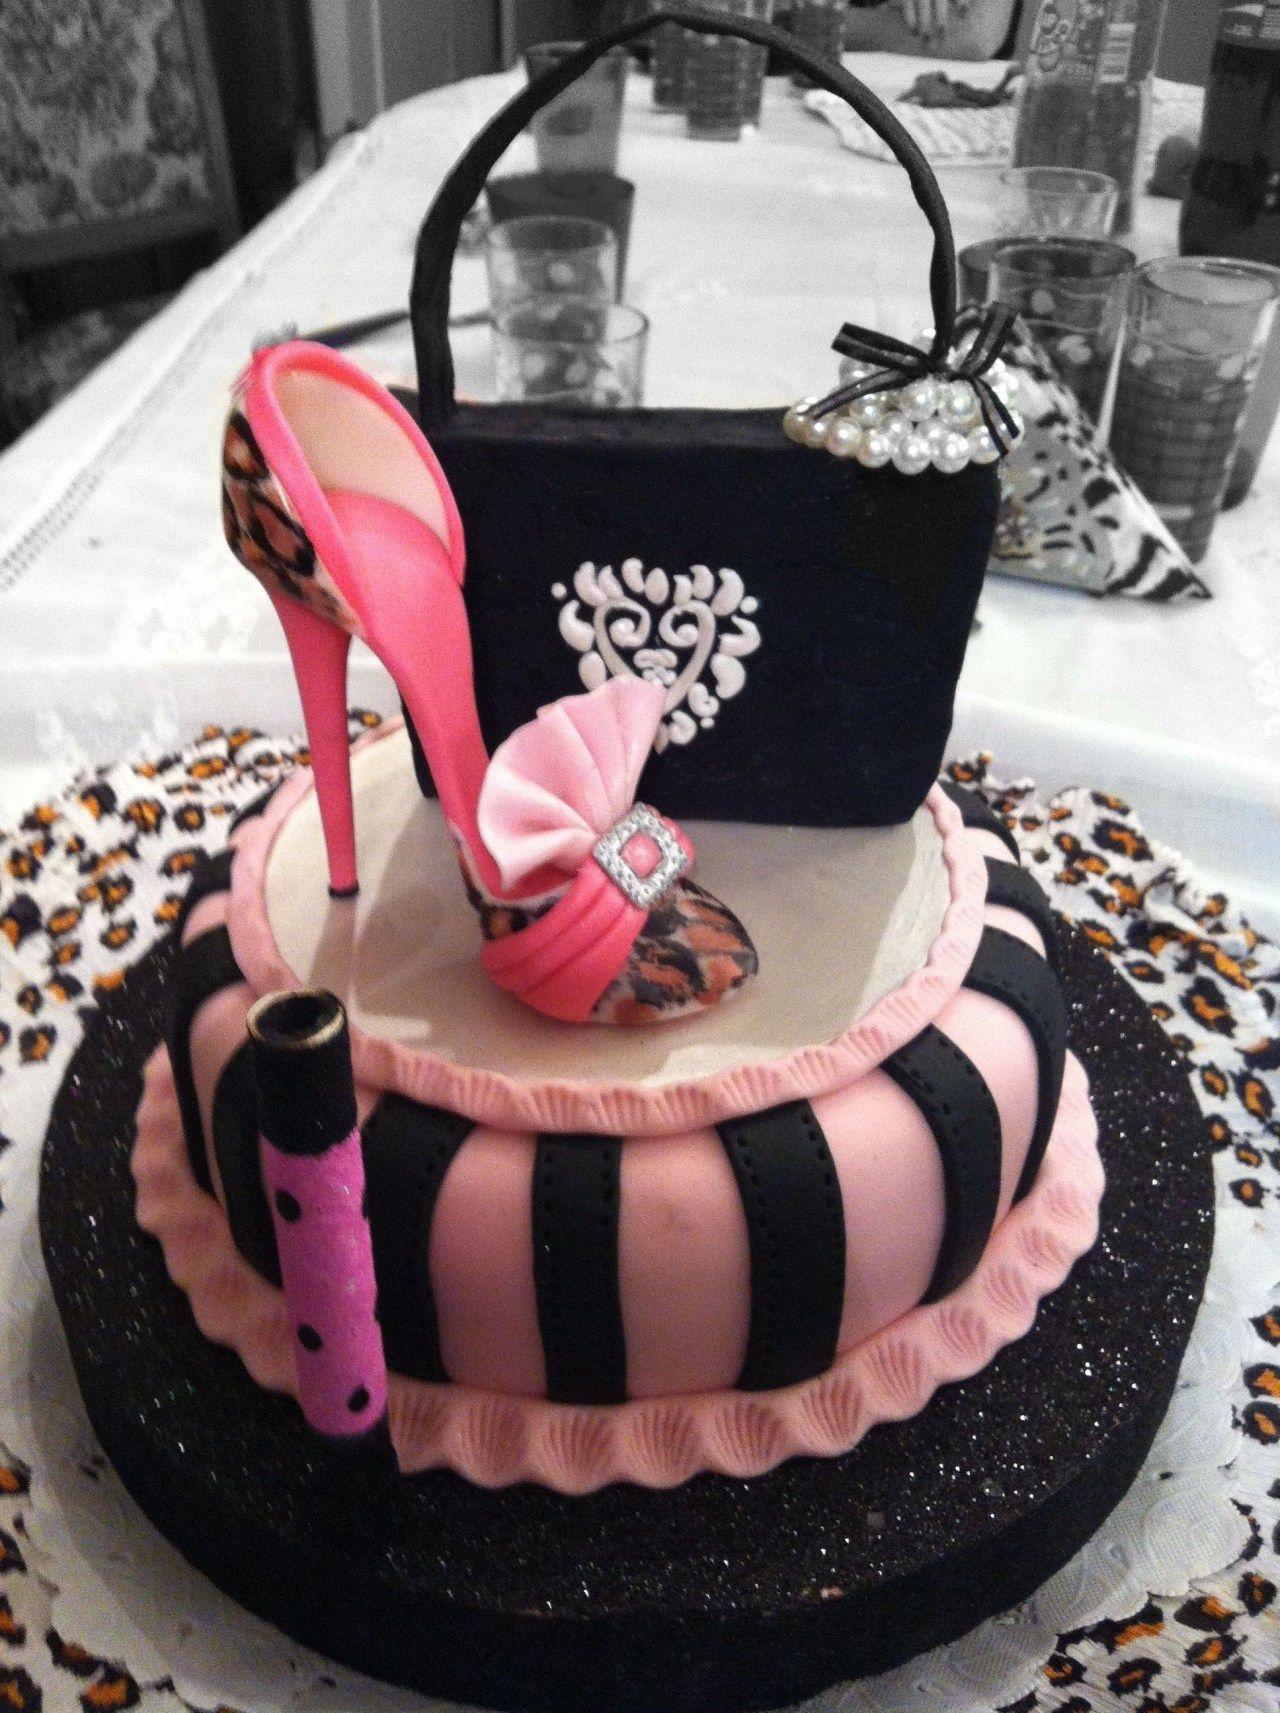 Miraculous Woman Birthday Cake Top 20 Amazing Birthday Cake Women Ideas Cake Funny Birthday Cards Online Overcheapnameinfo